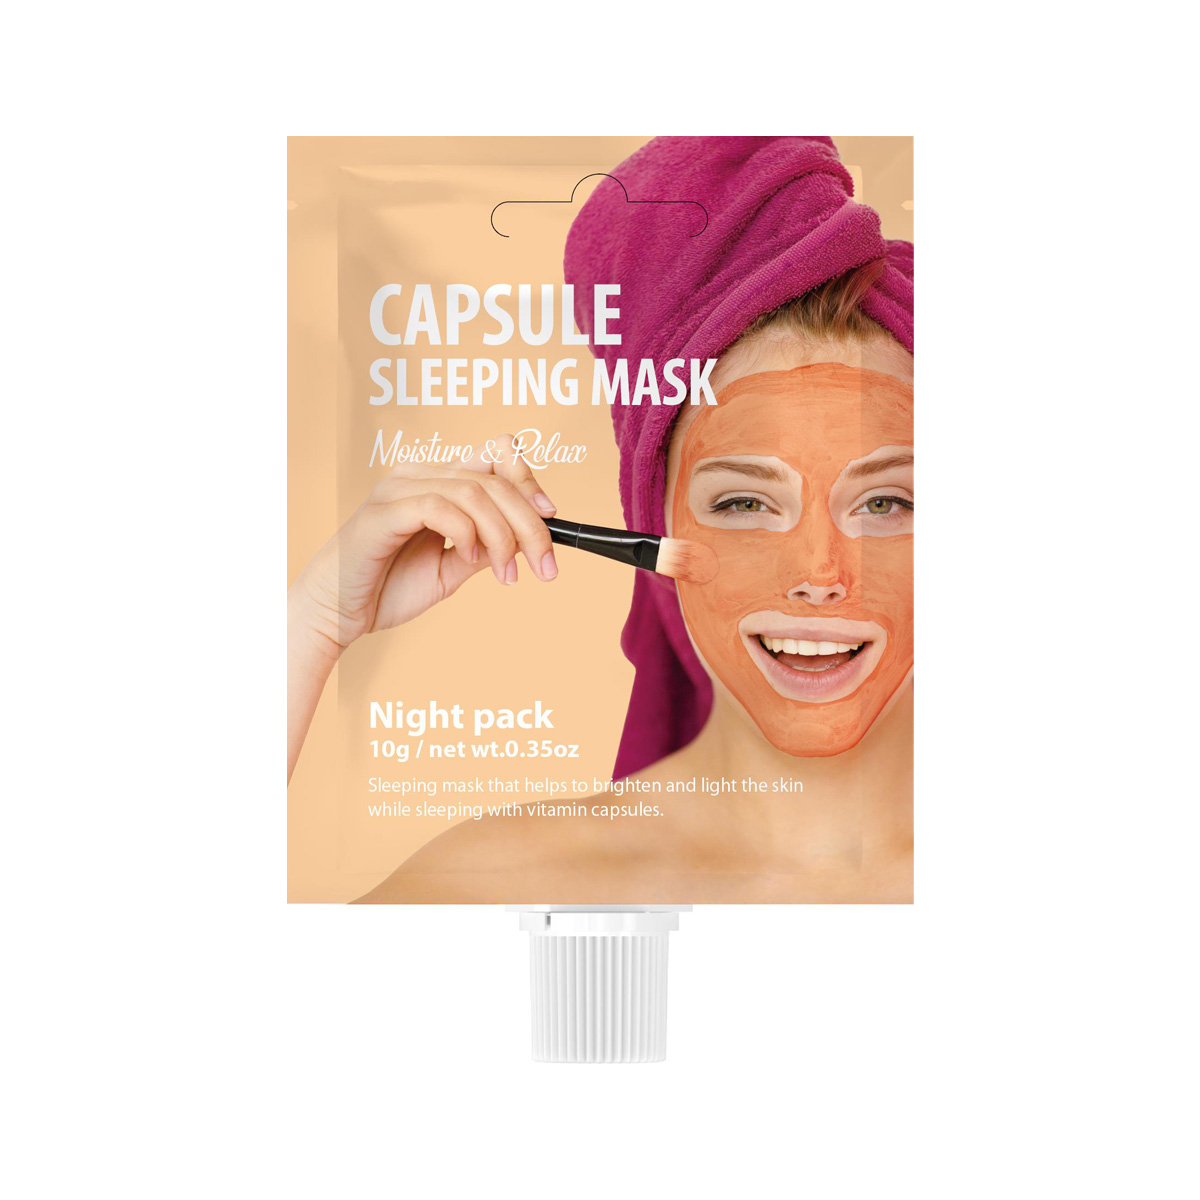 SHE'S LAB CAPSULE SLEEPING MASK 10g